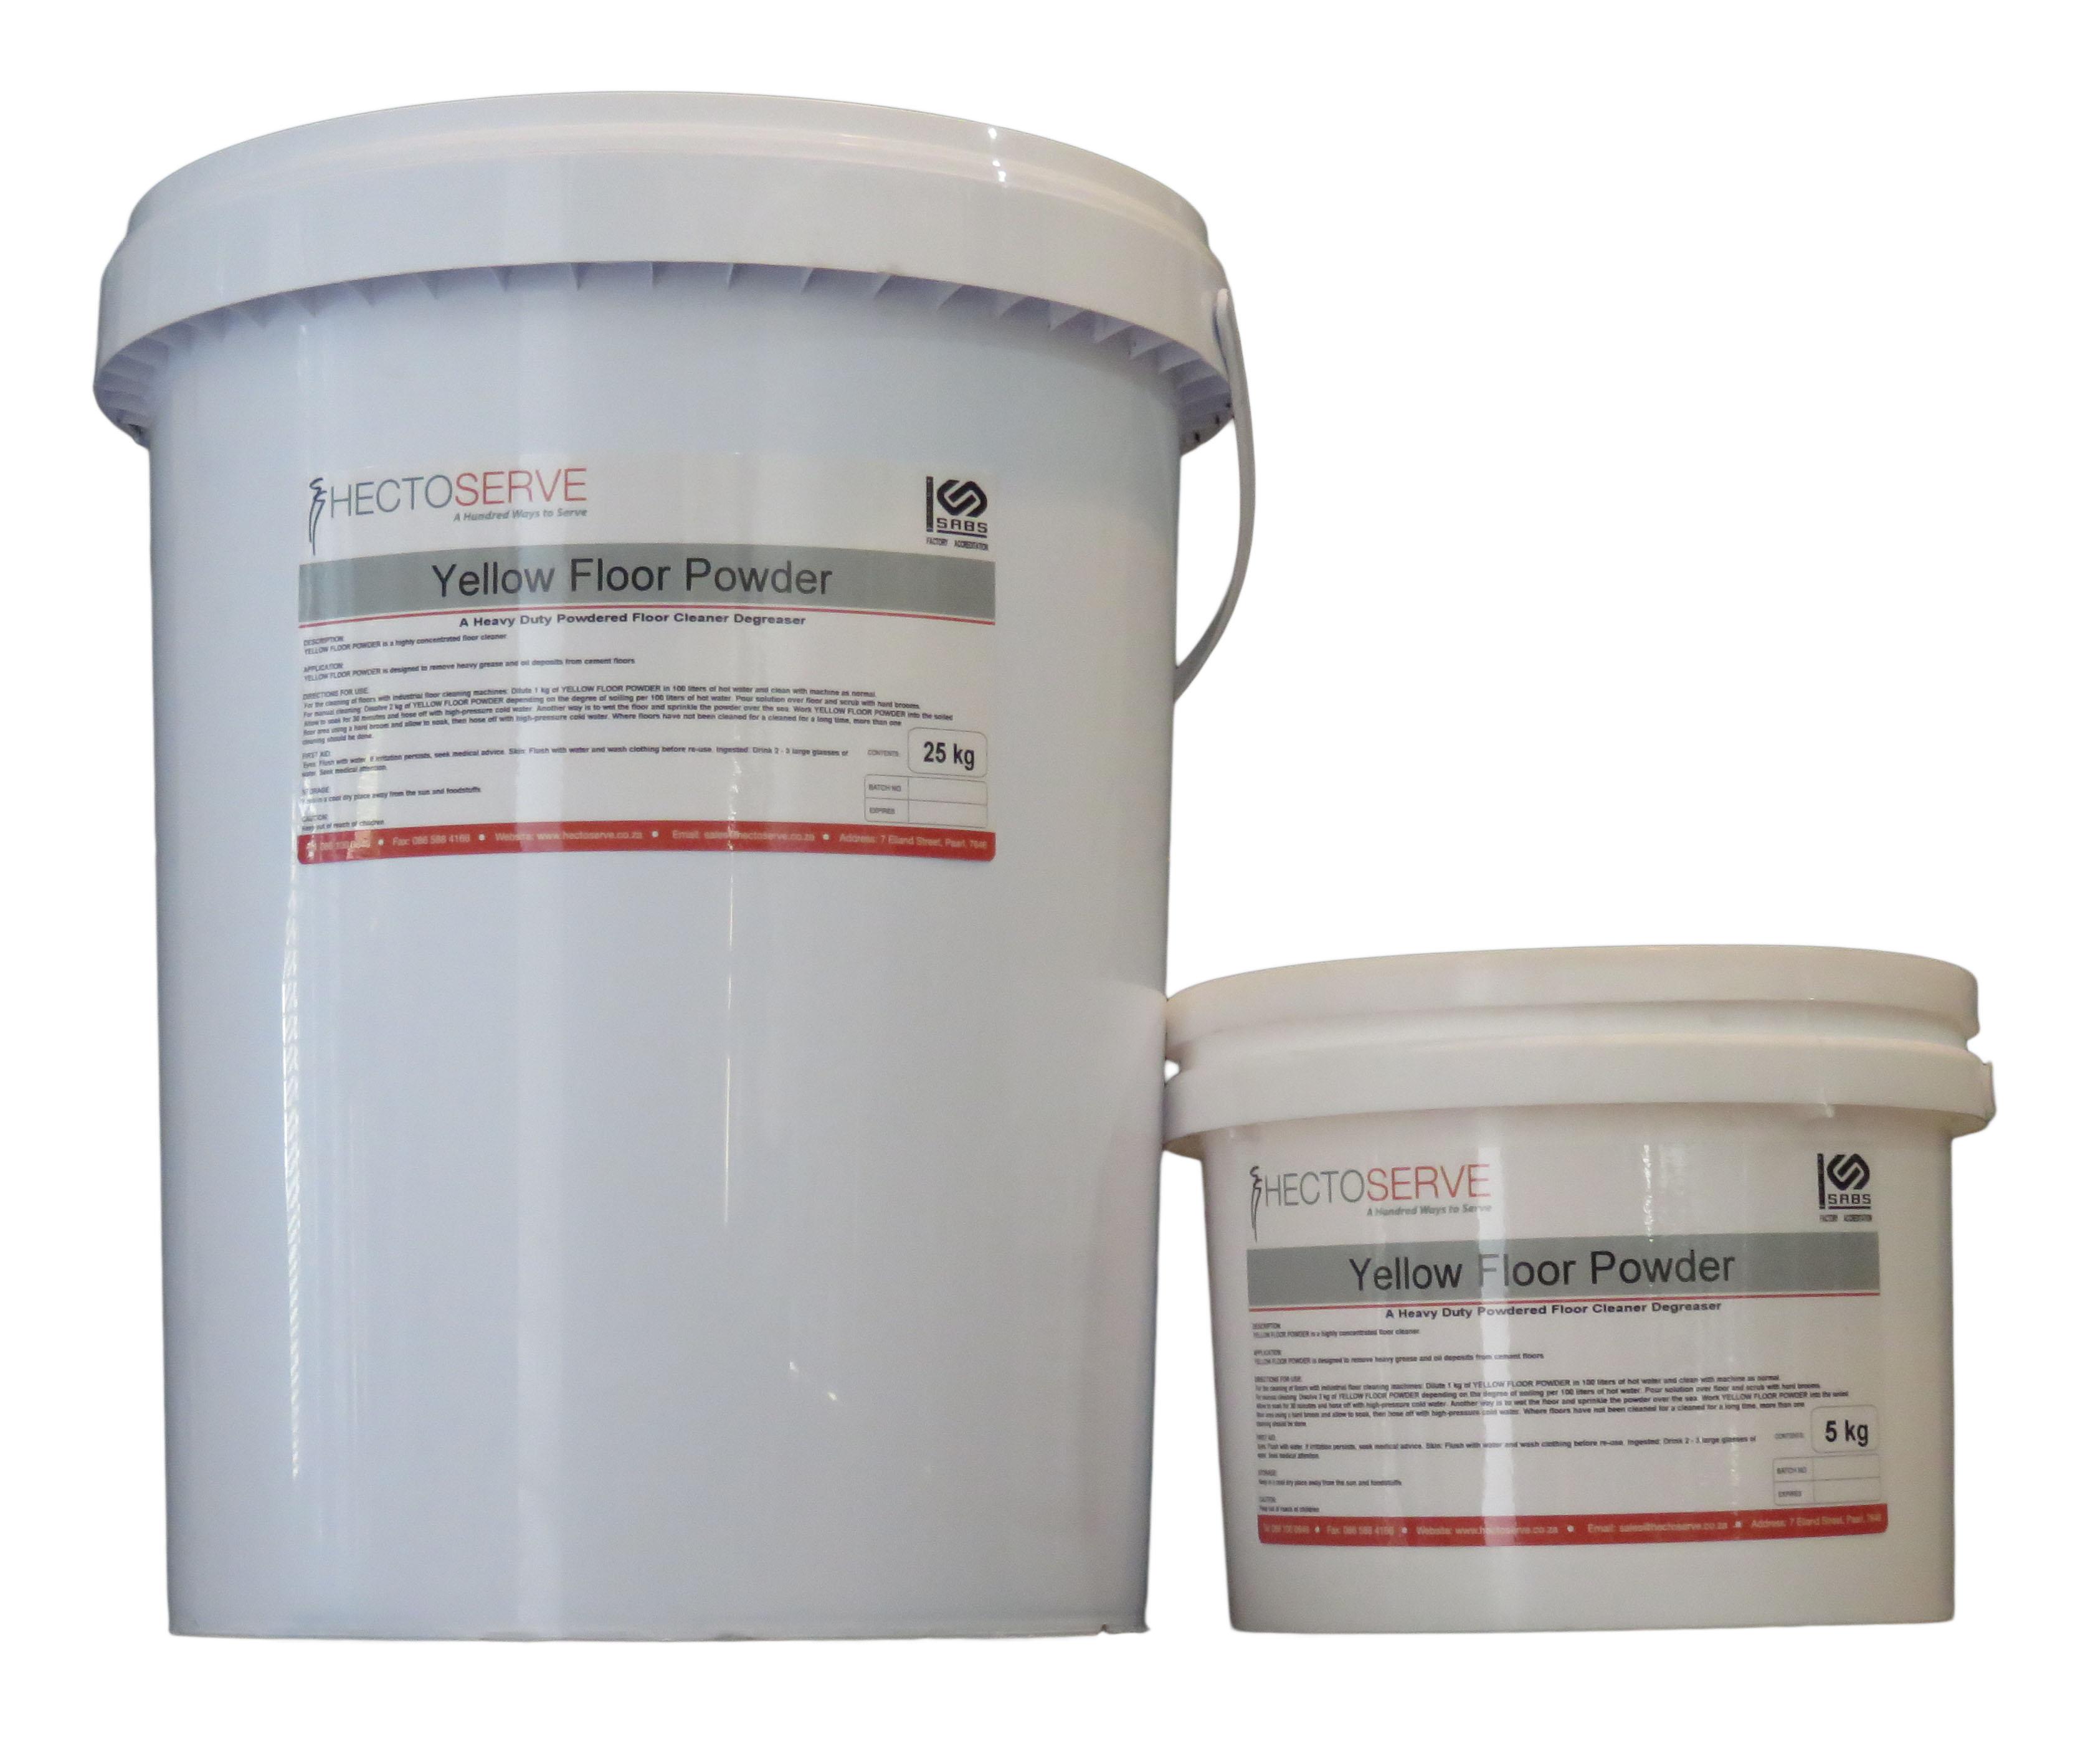 Hectoserve Yellow Floor Powder